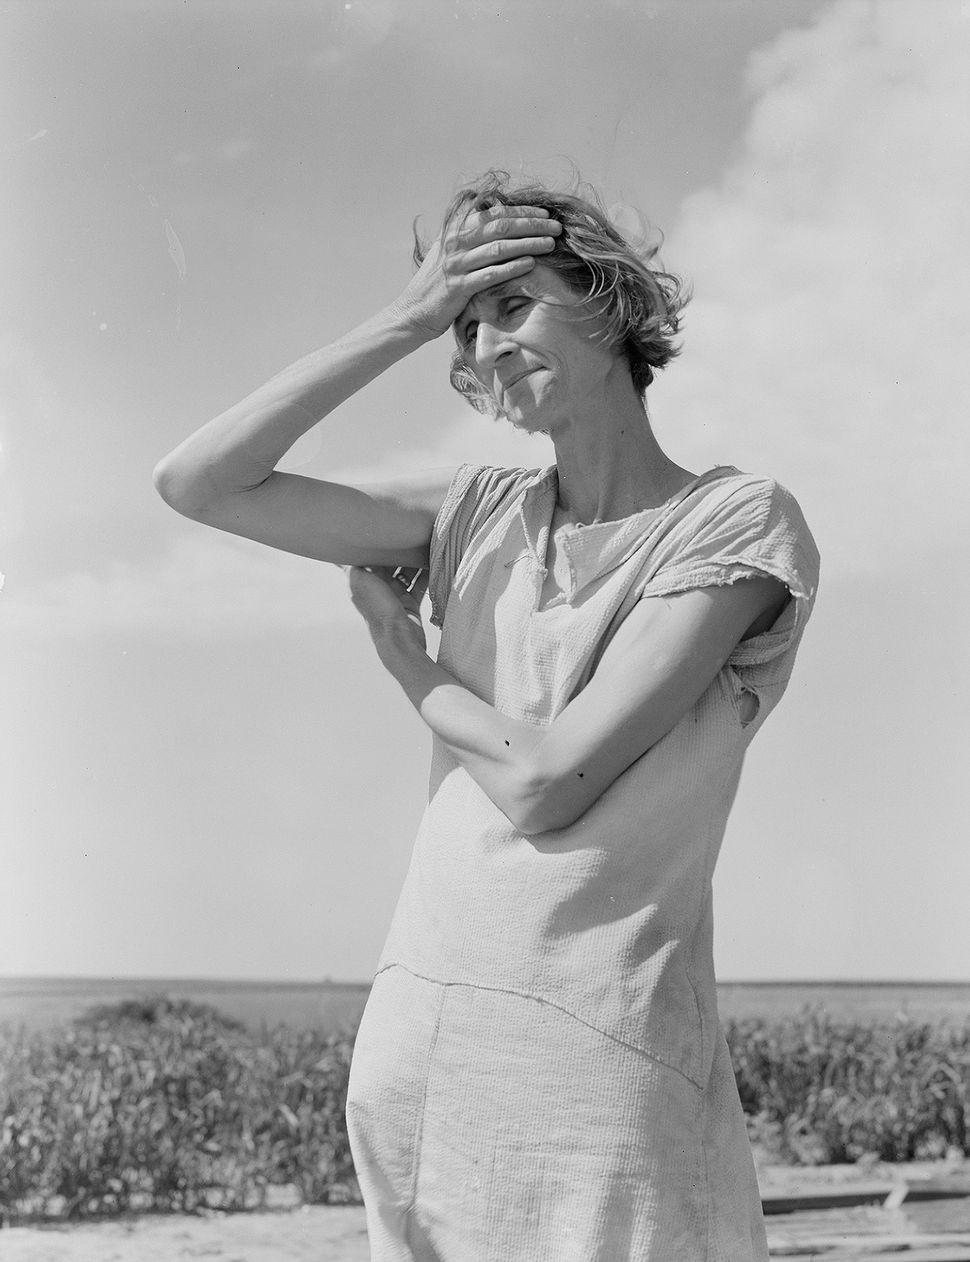 Dorothea Lange, Wife of a migratory laborer with three children. Near Childress, Texas. Nettie Featherson, 1938, Vintage gela